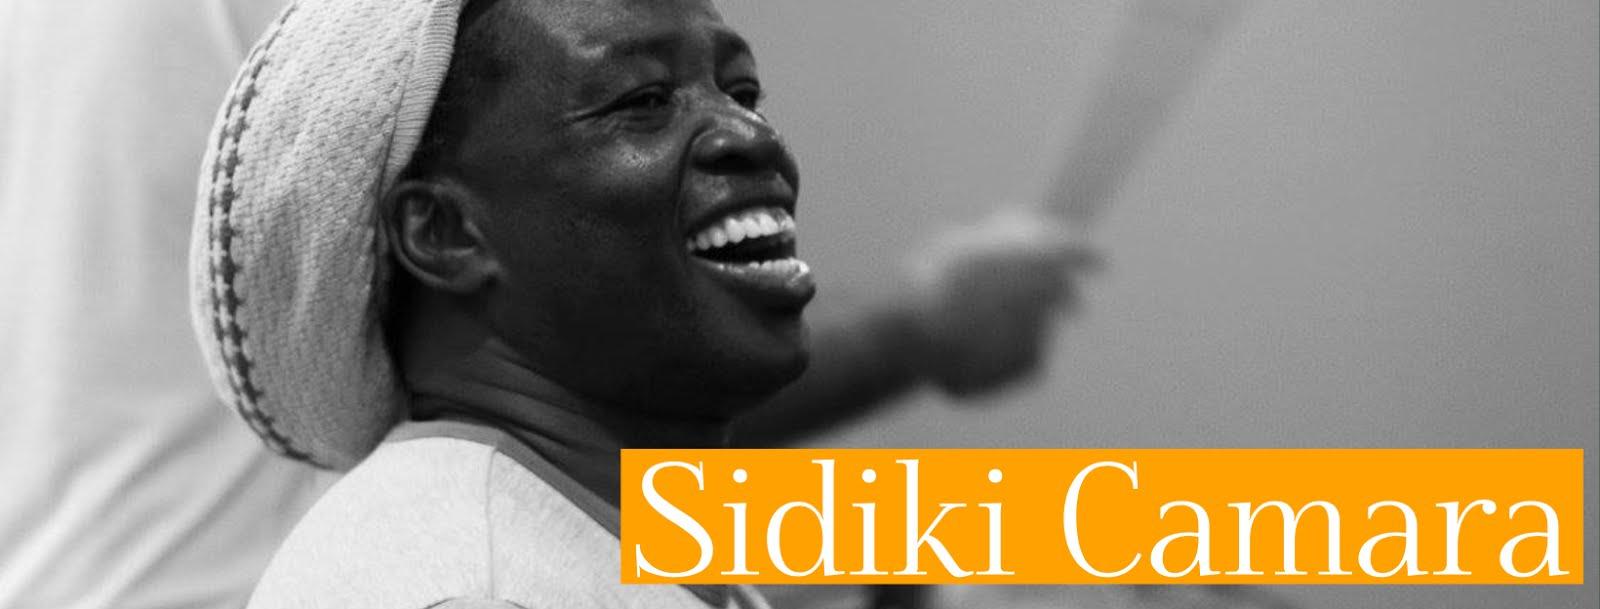 Sidiki Camara